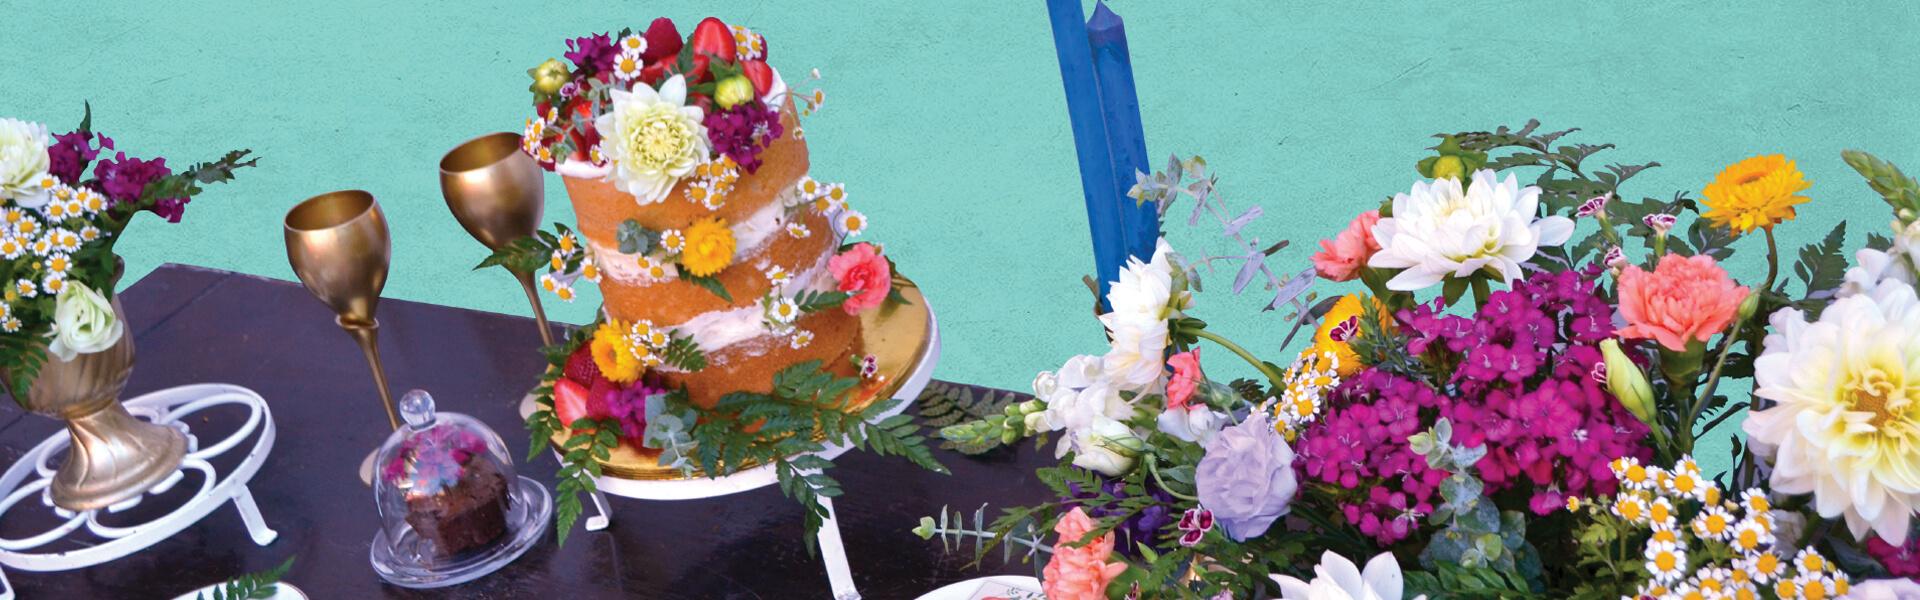 martha-olguin-servicios-para-decorar-tus-eventos-tijuana